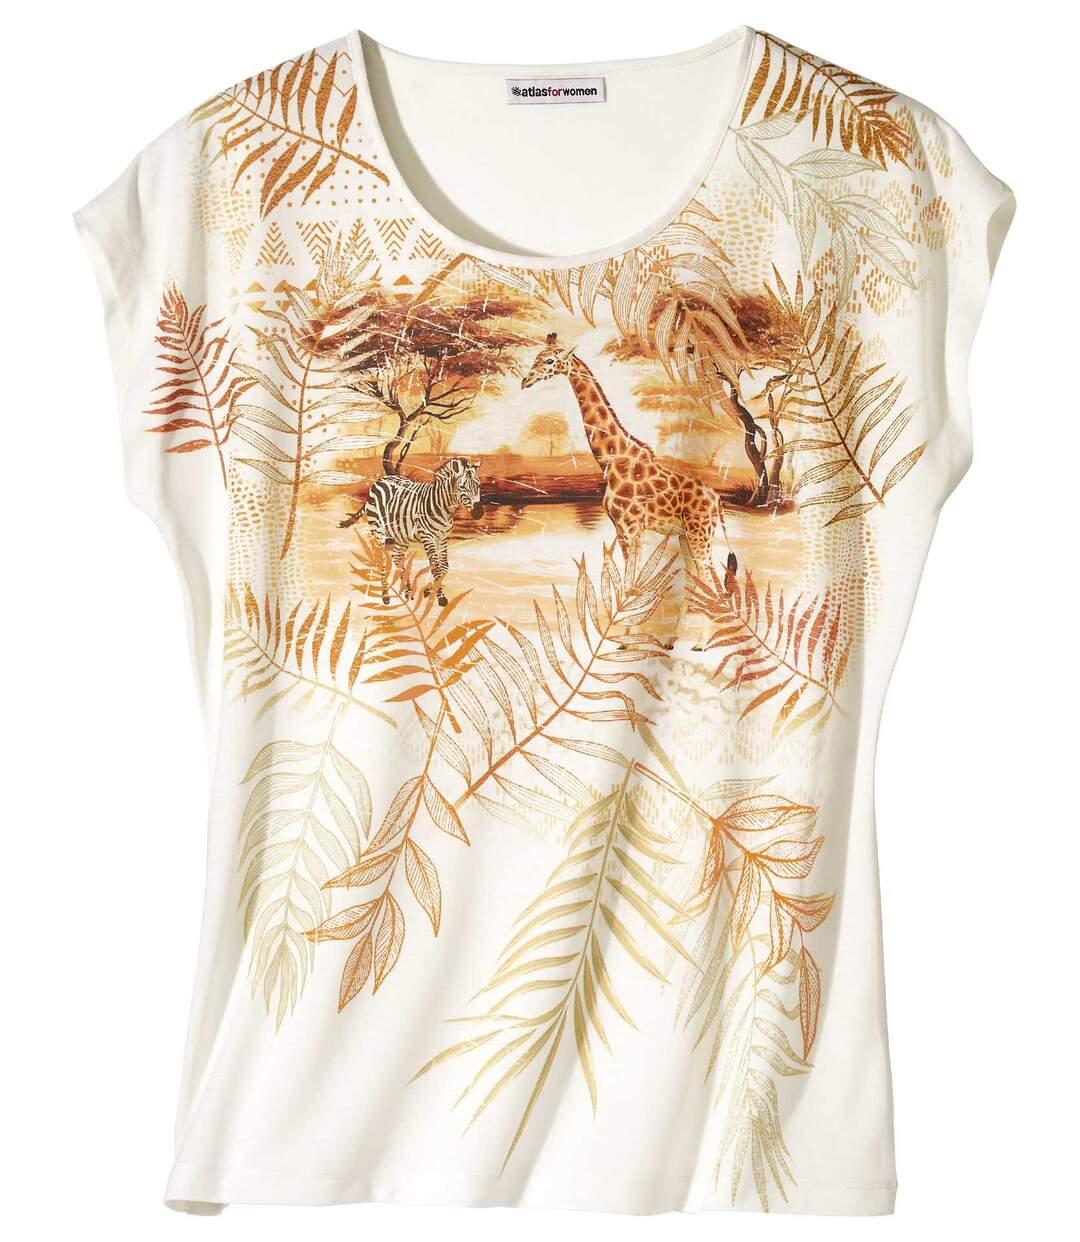 Bedrucktes T-Shirt Savanne Atlas For Men